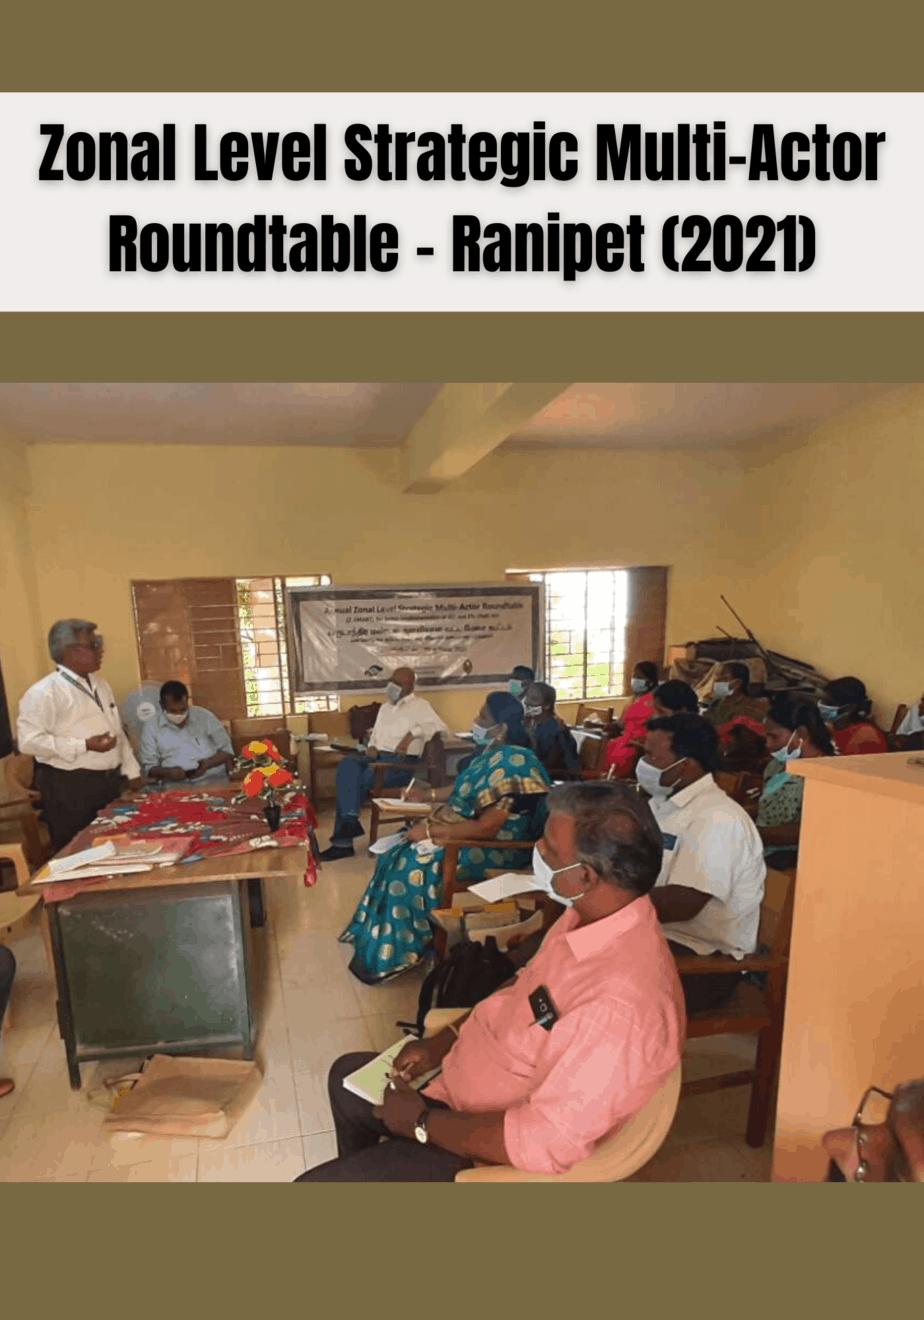 Annual Z-SMART 2021 – Ranipet